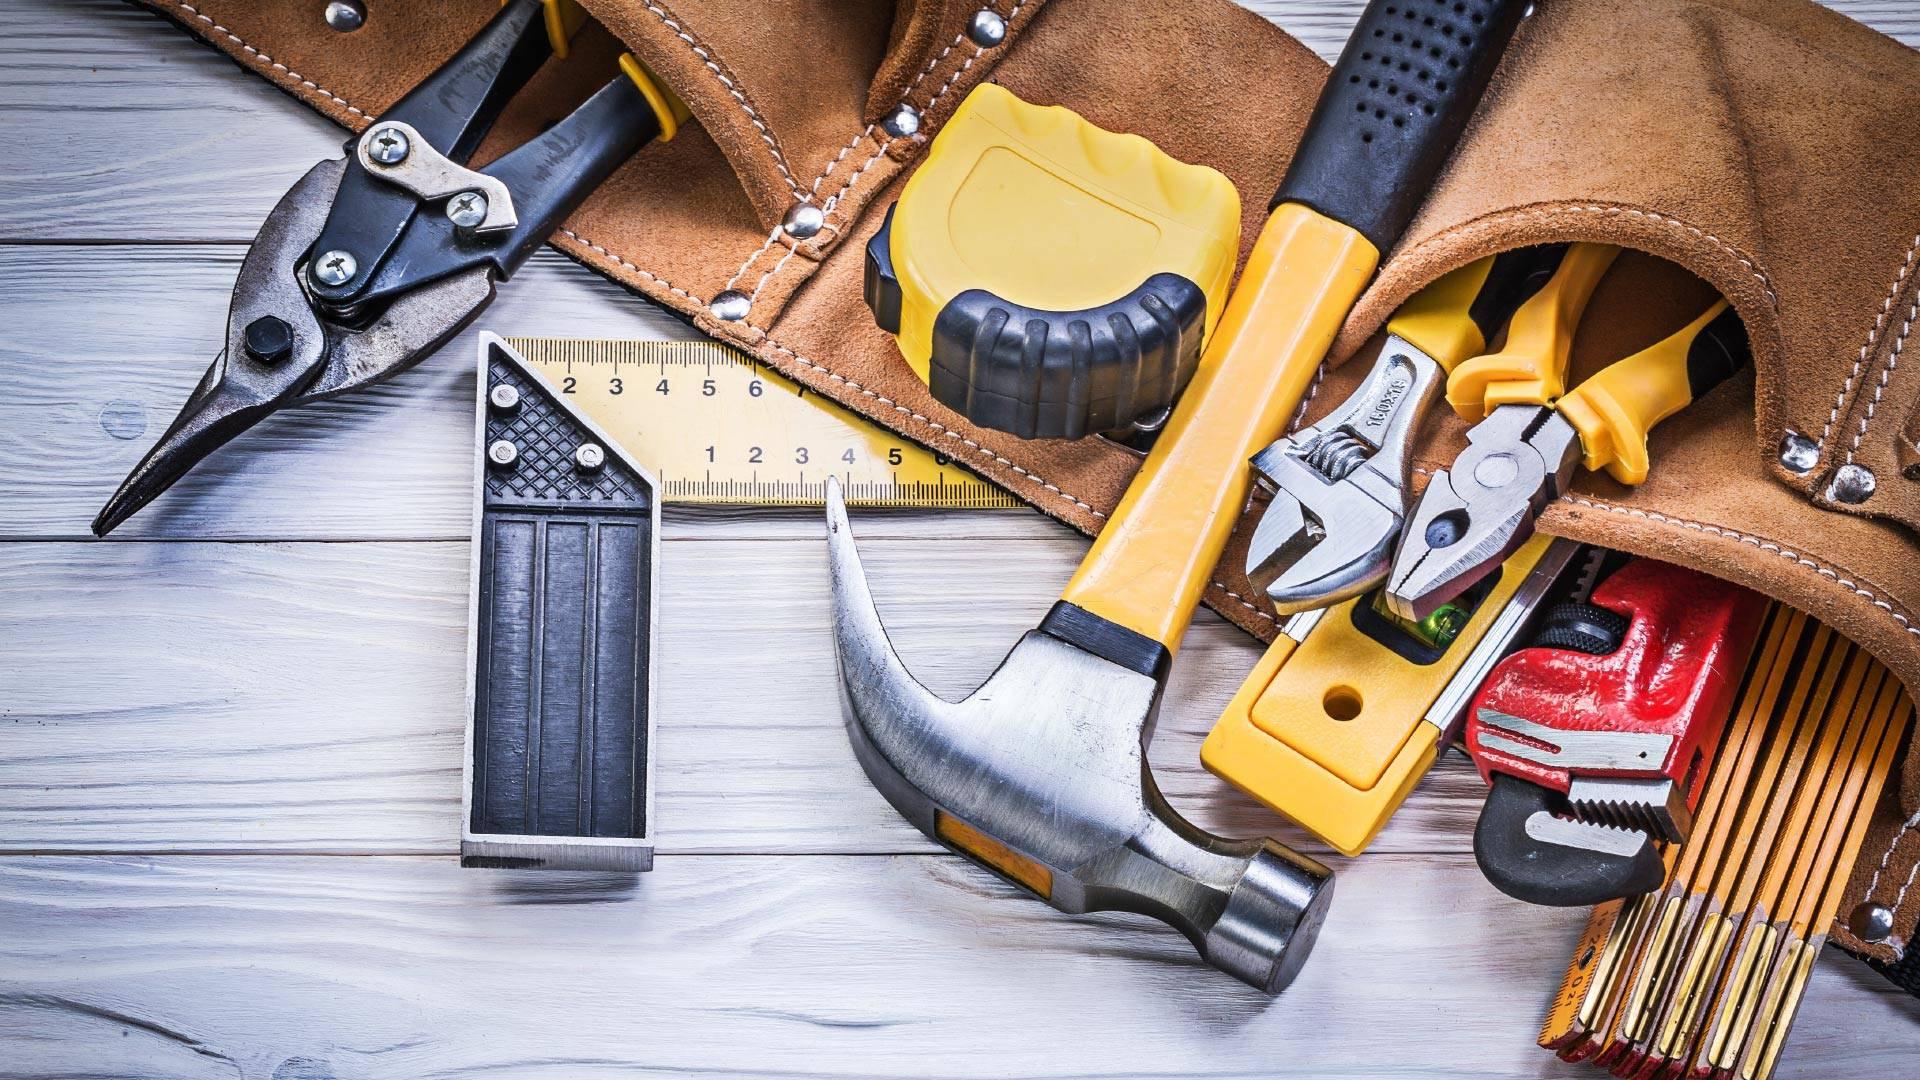 Tools & Testing Instruments